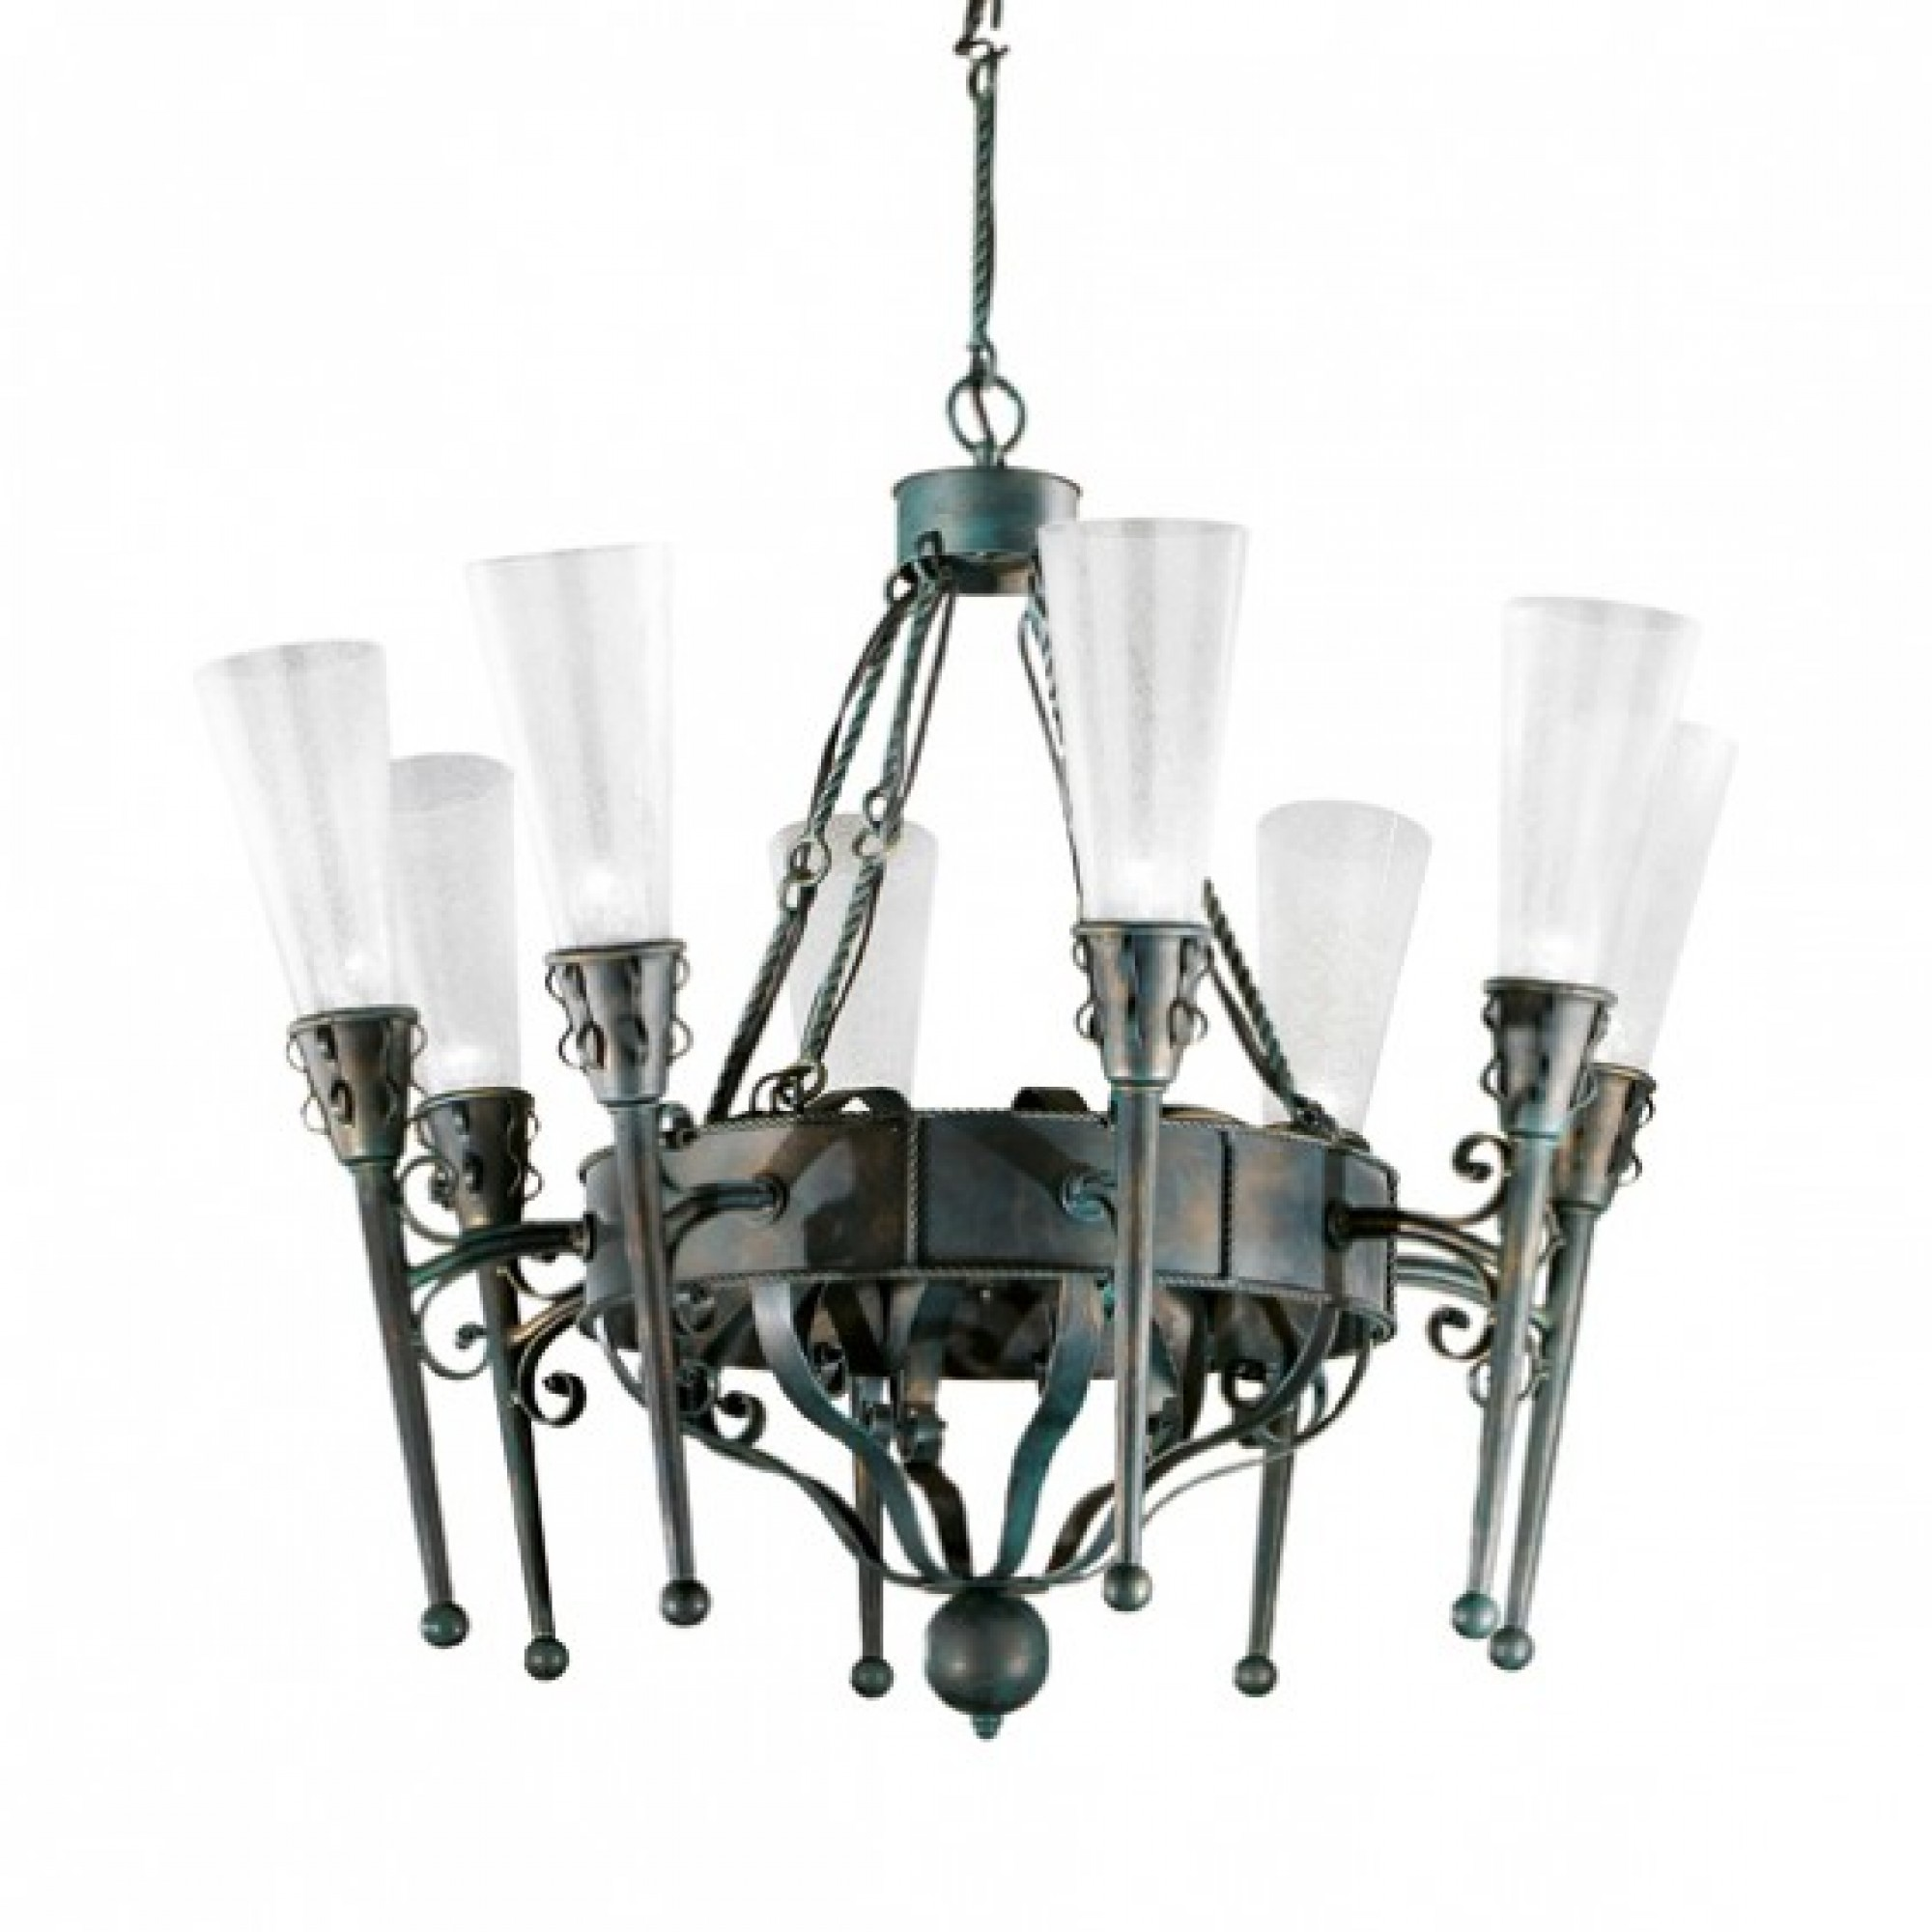 8L SARKIT - Modern -  MM LAMPADARI